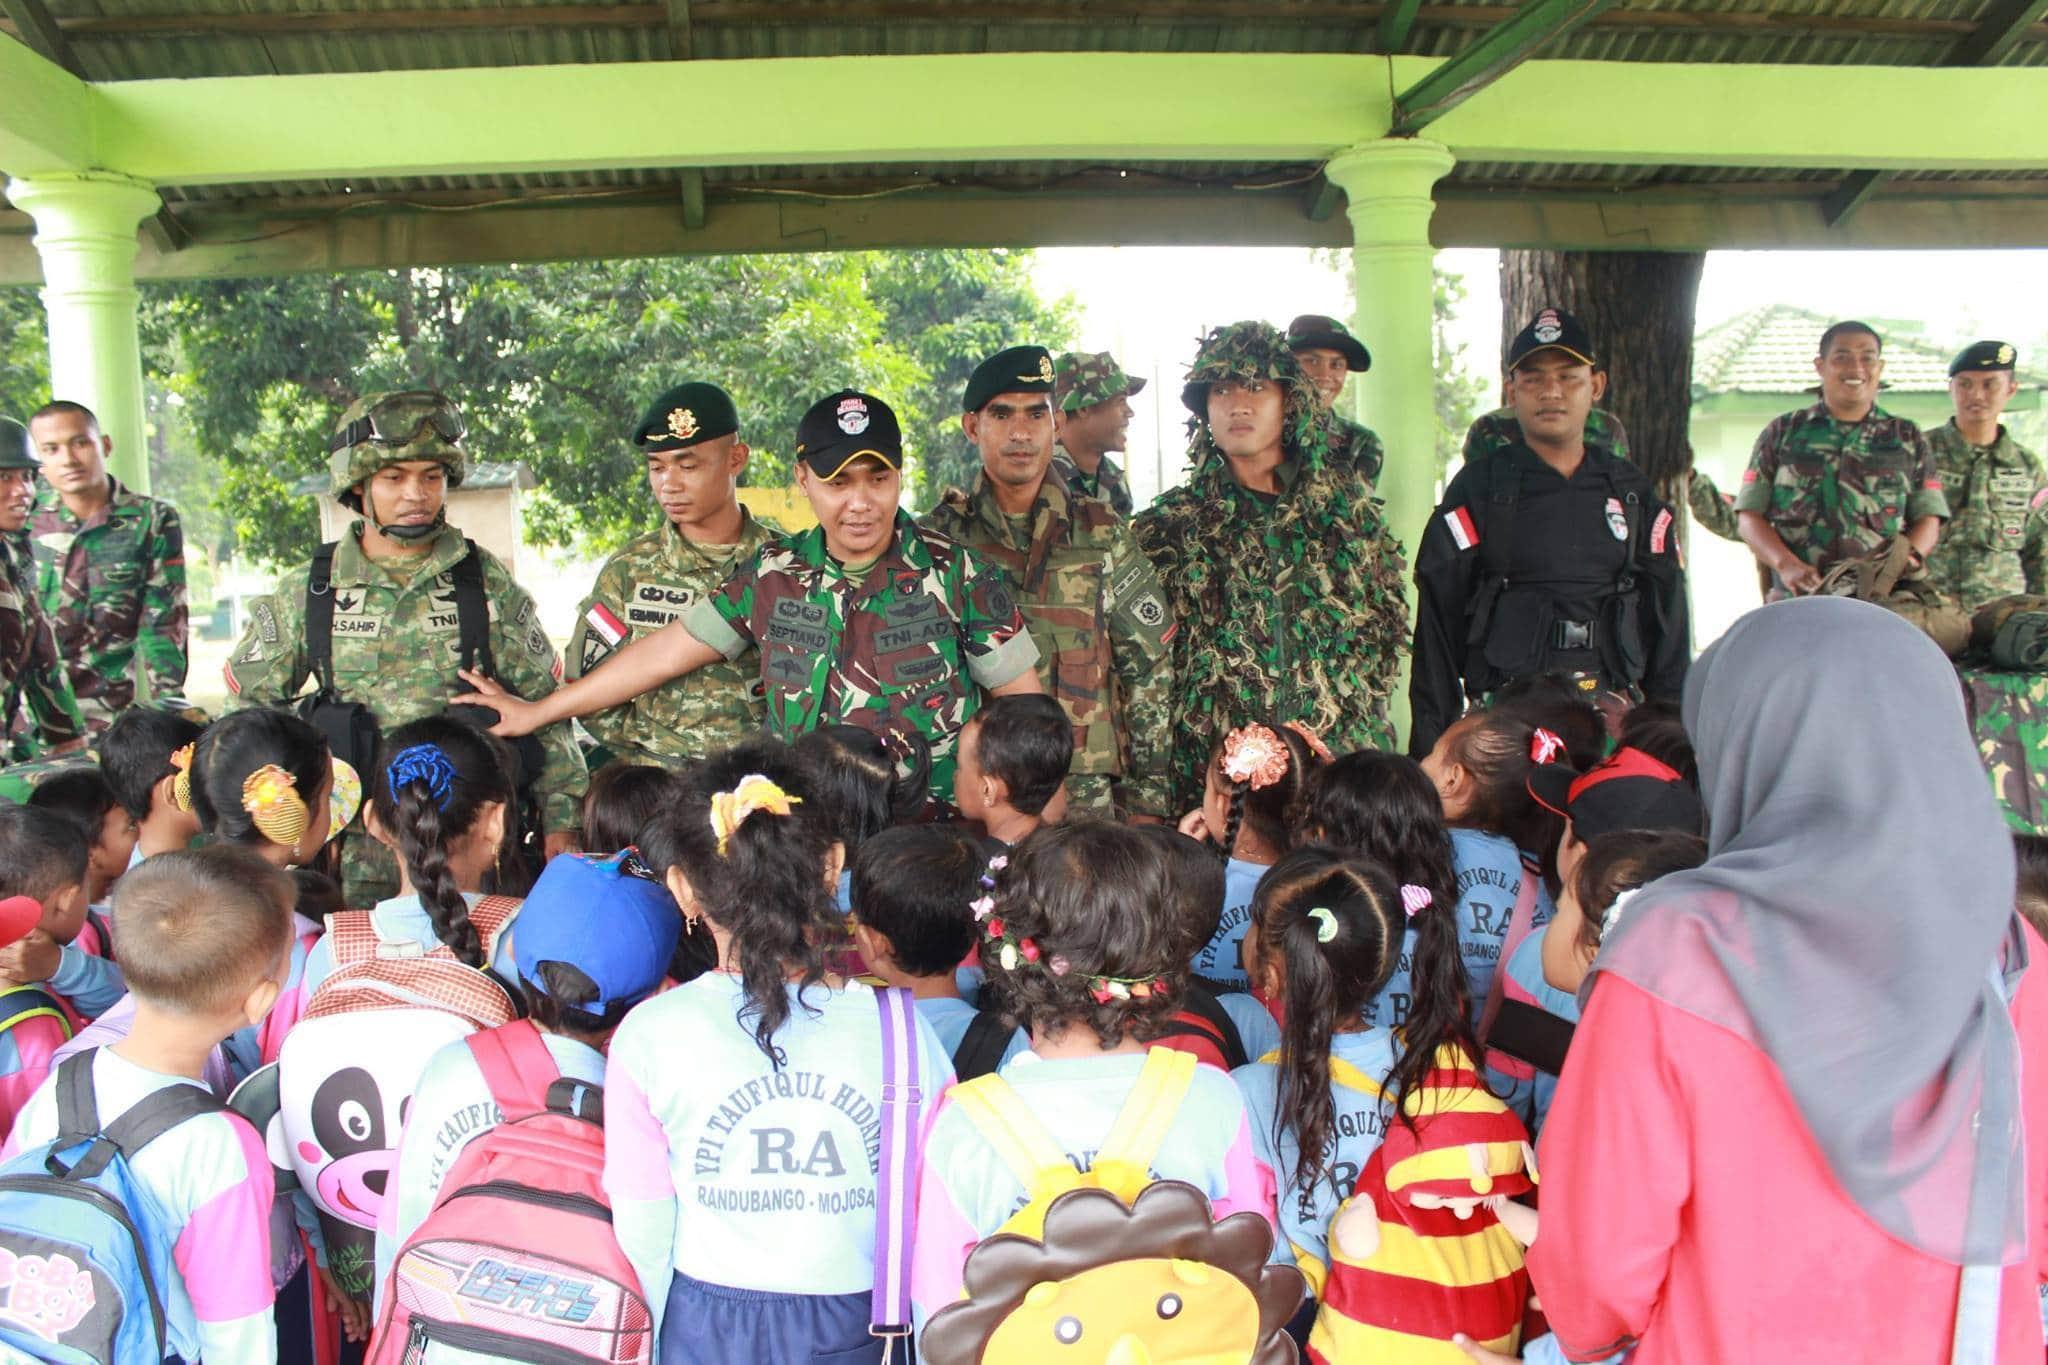 Siswa TK Roudhlatul Atfhal Taufiqul Hidayah Kunjungi Batalyon Para Raider 503 Mayangkara Kostrad